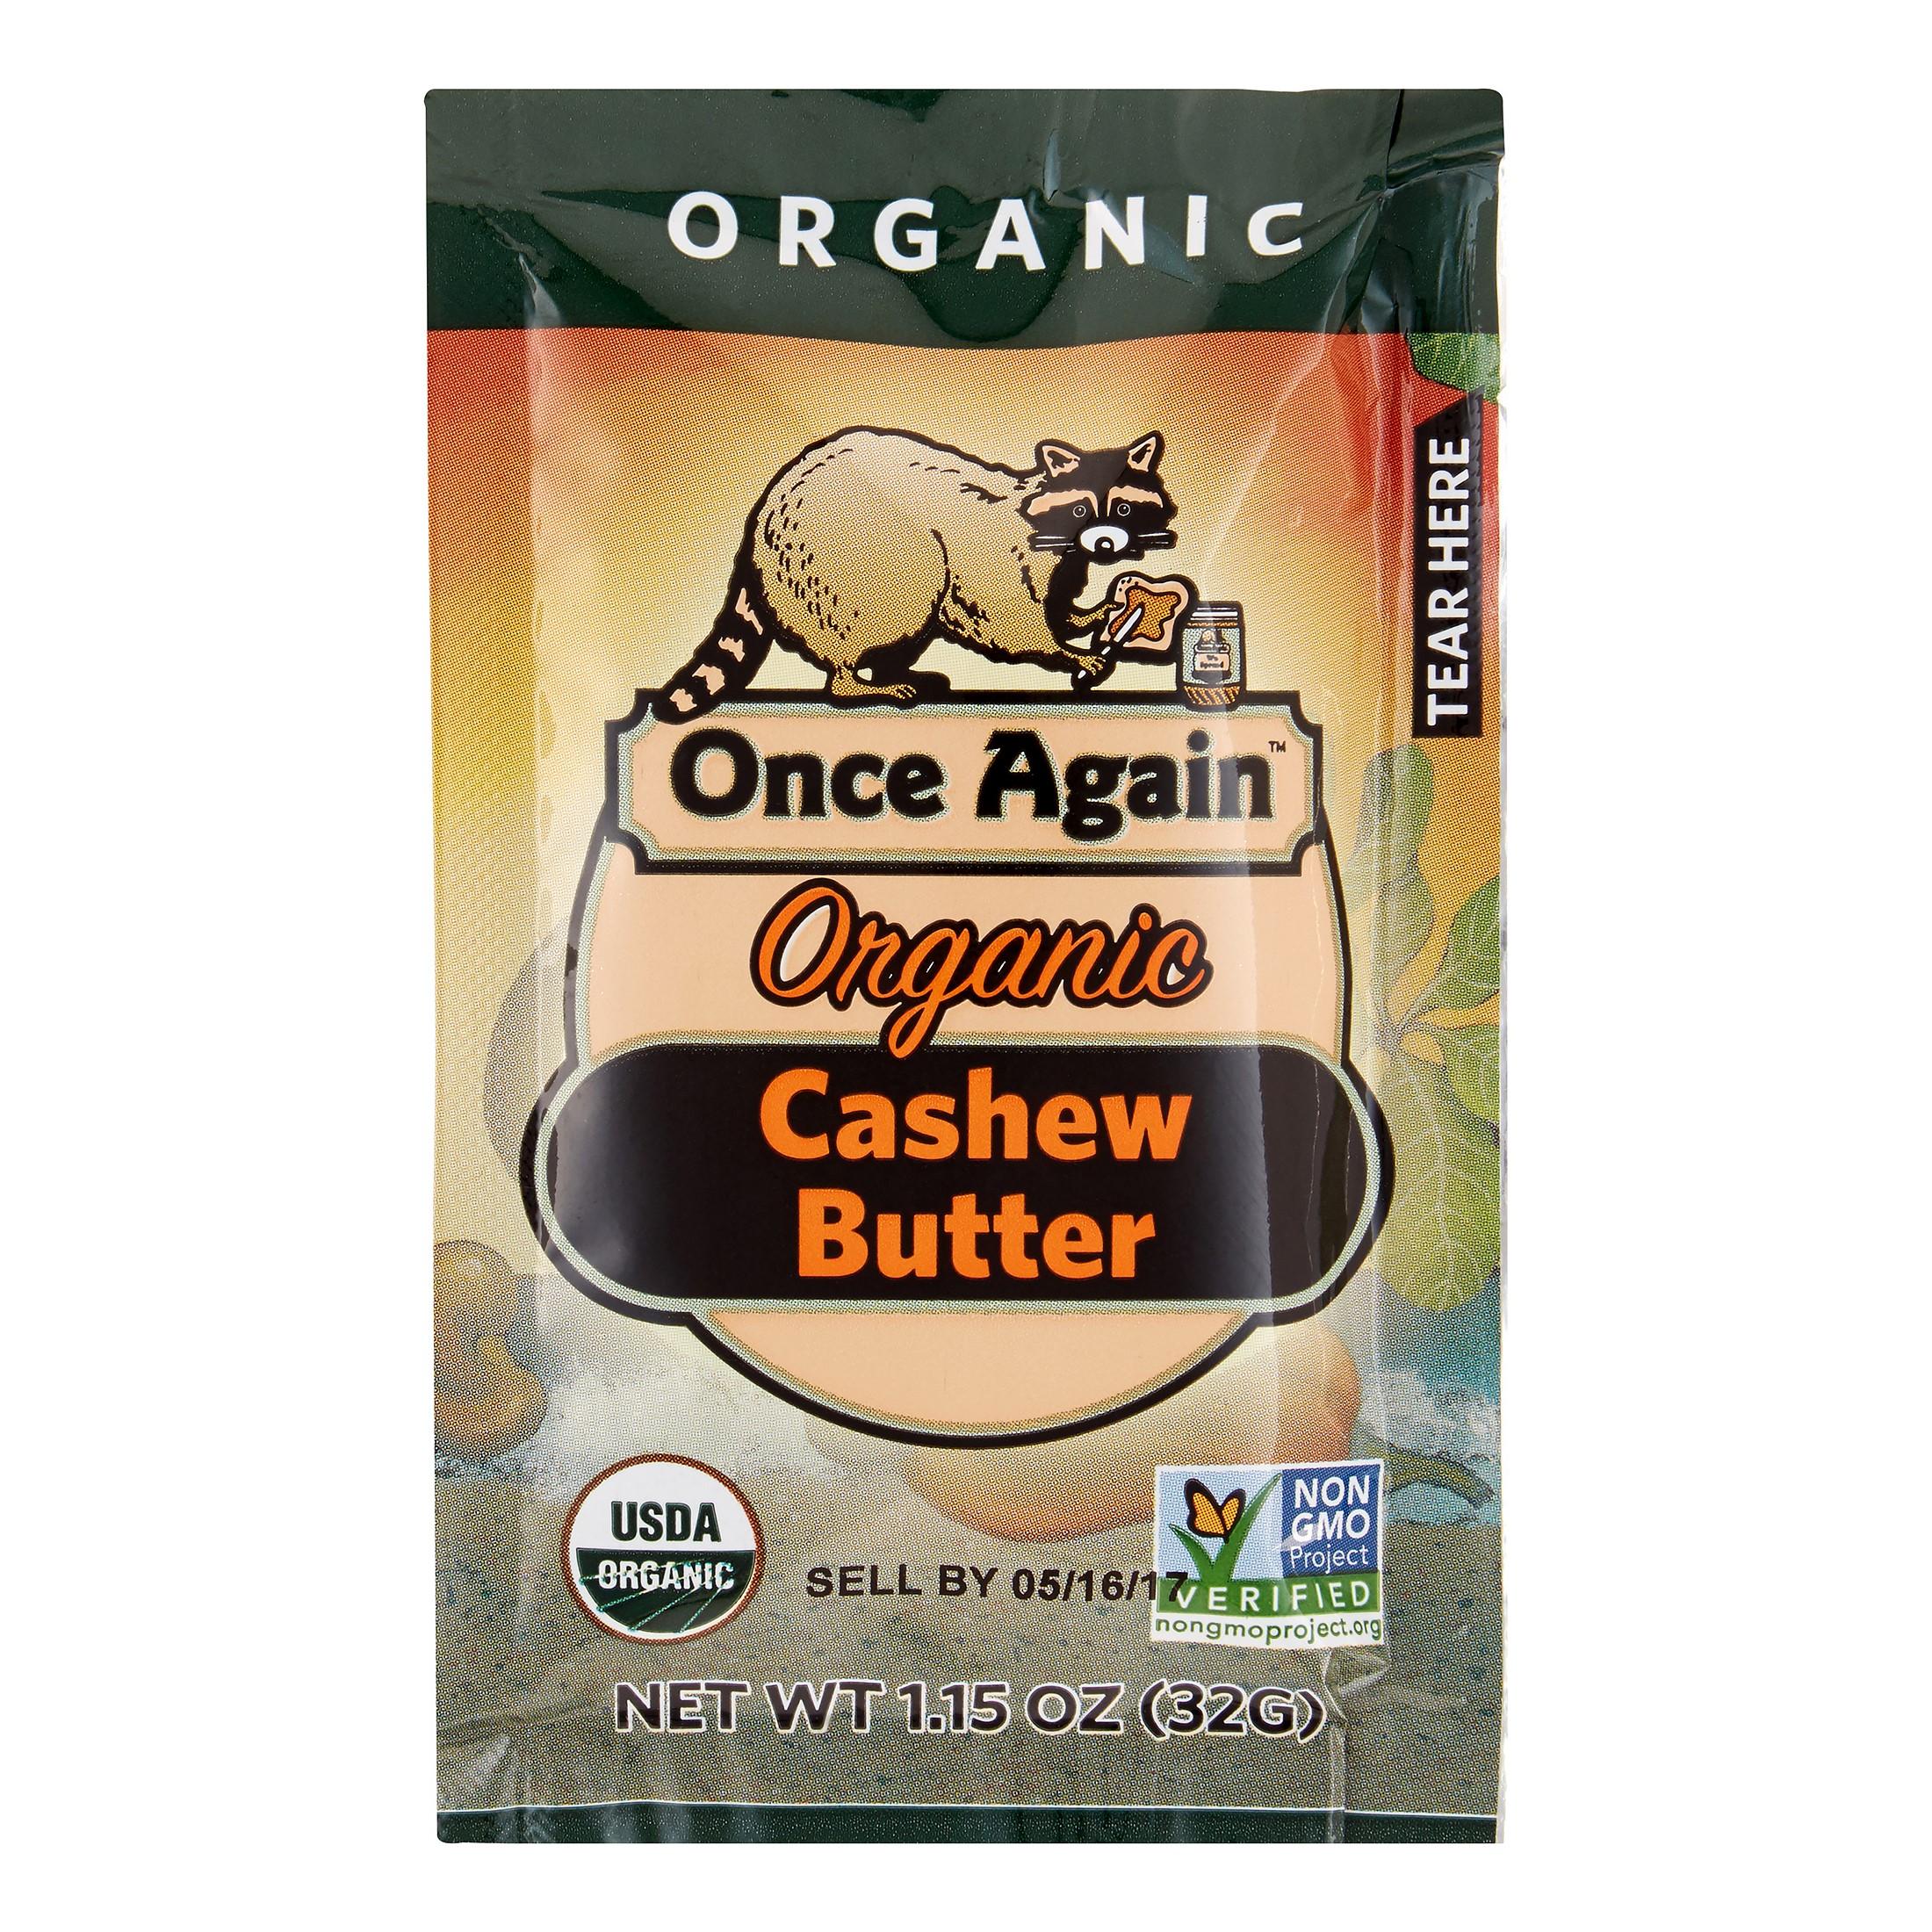 Once Again Organic Cashew Butter, 1.15 Oz